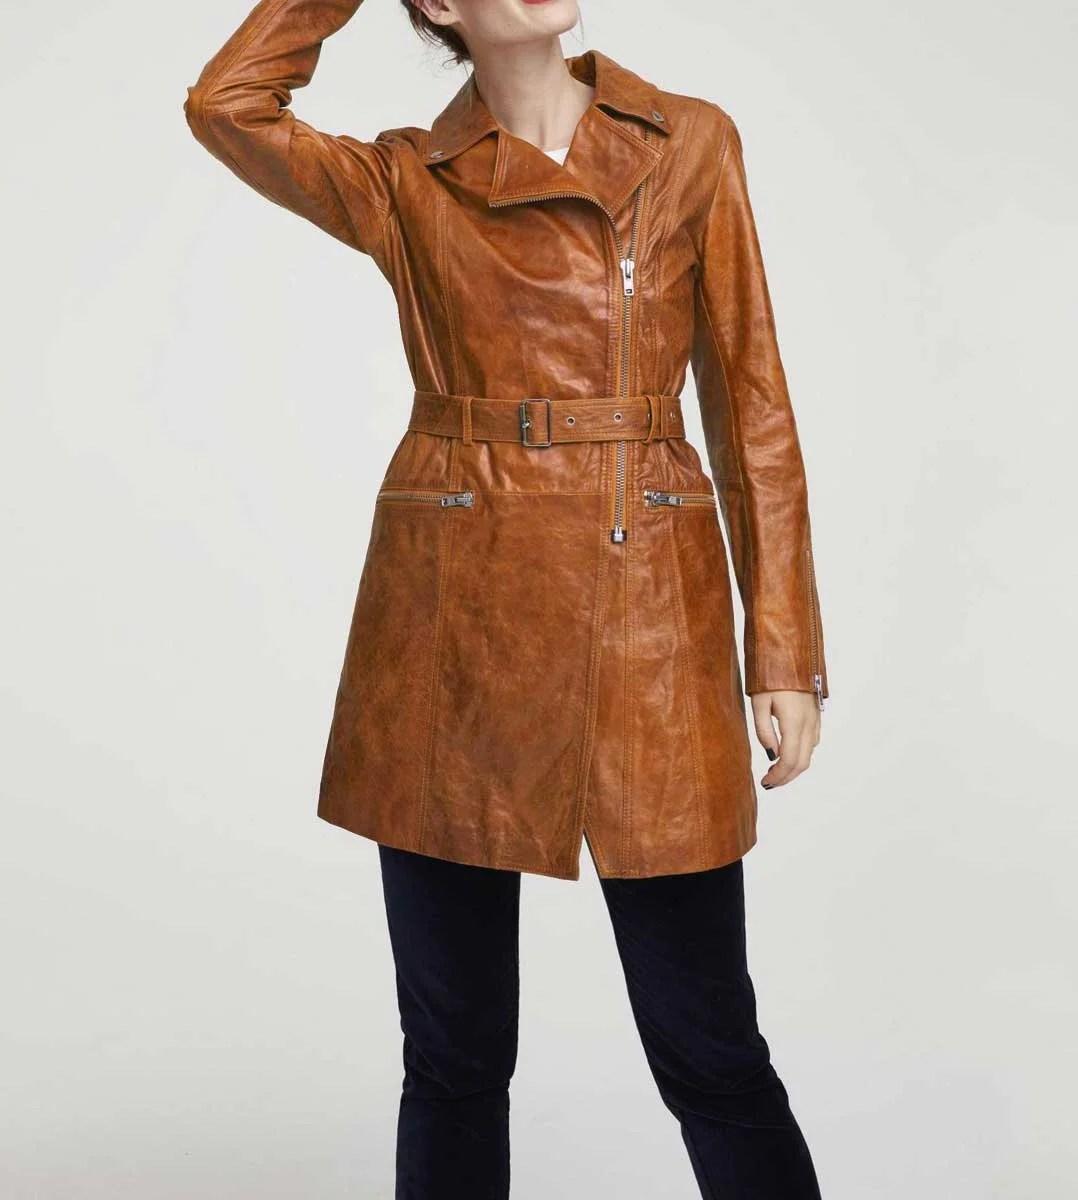 674.362 HEINE Damen Designer-Lammnappa-Ledermantel Mantel Echt Leder 44 Cognac Braun